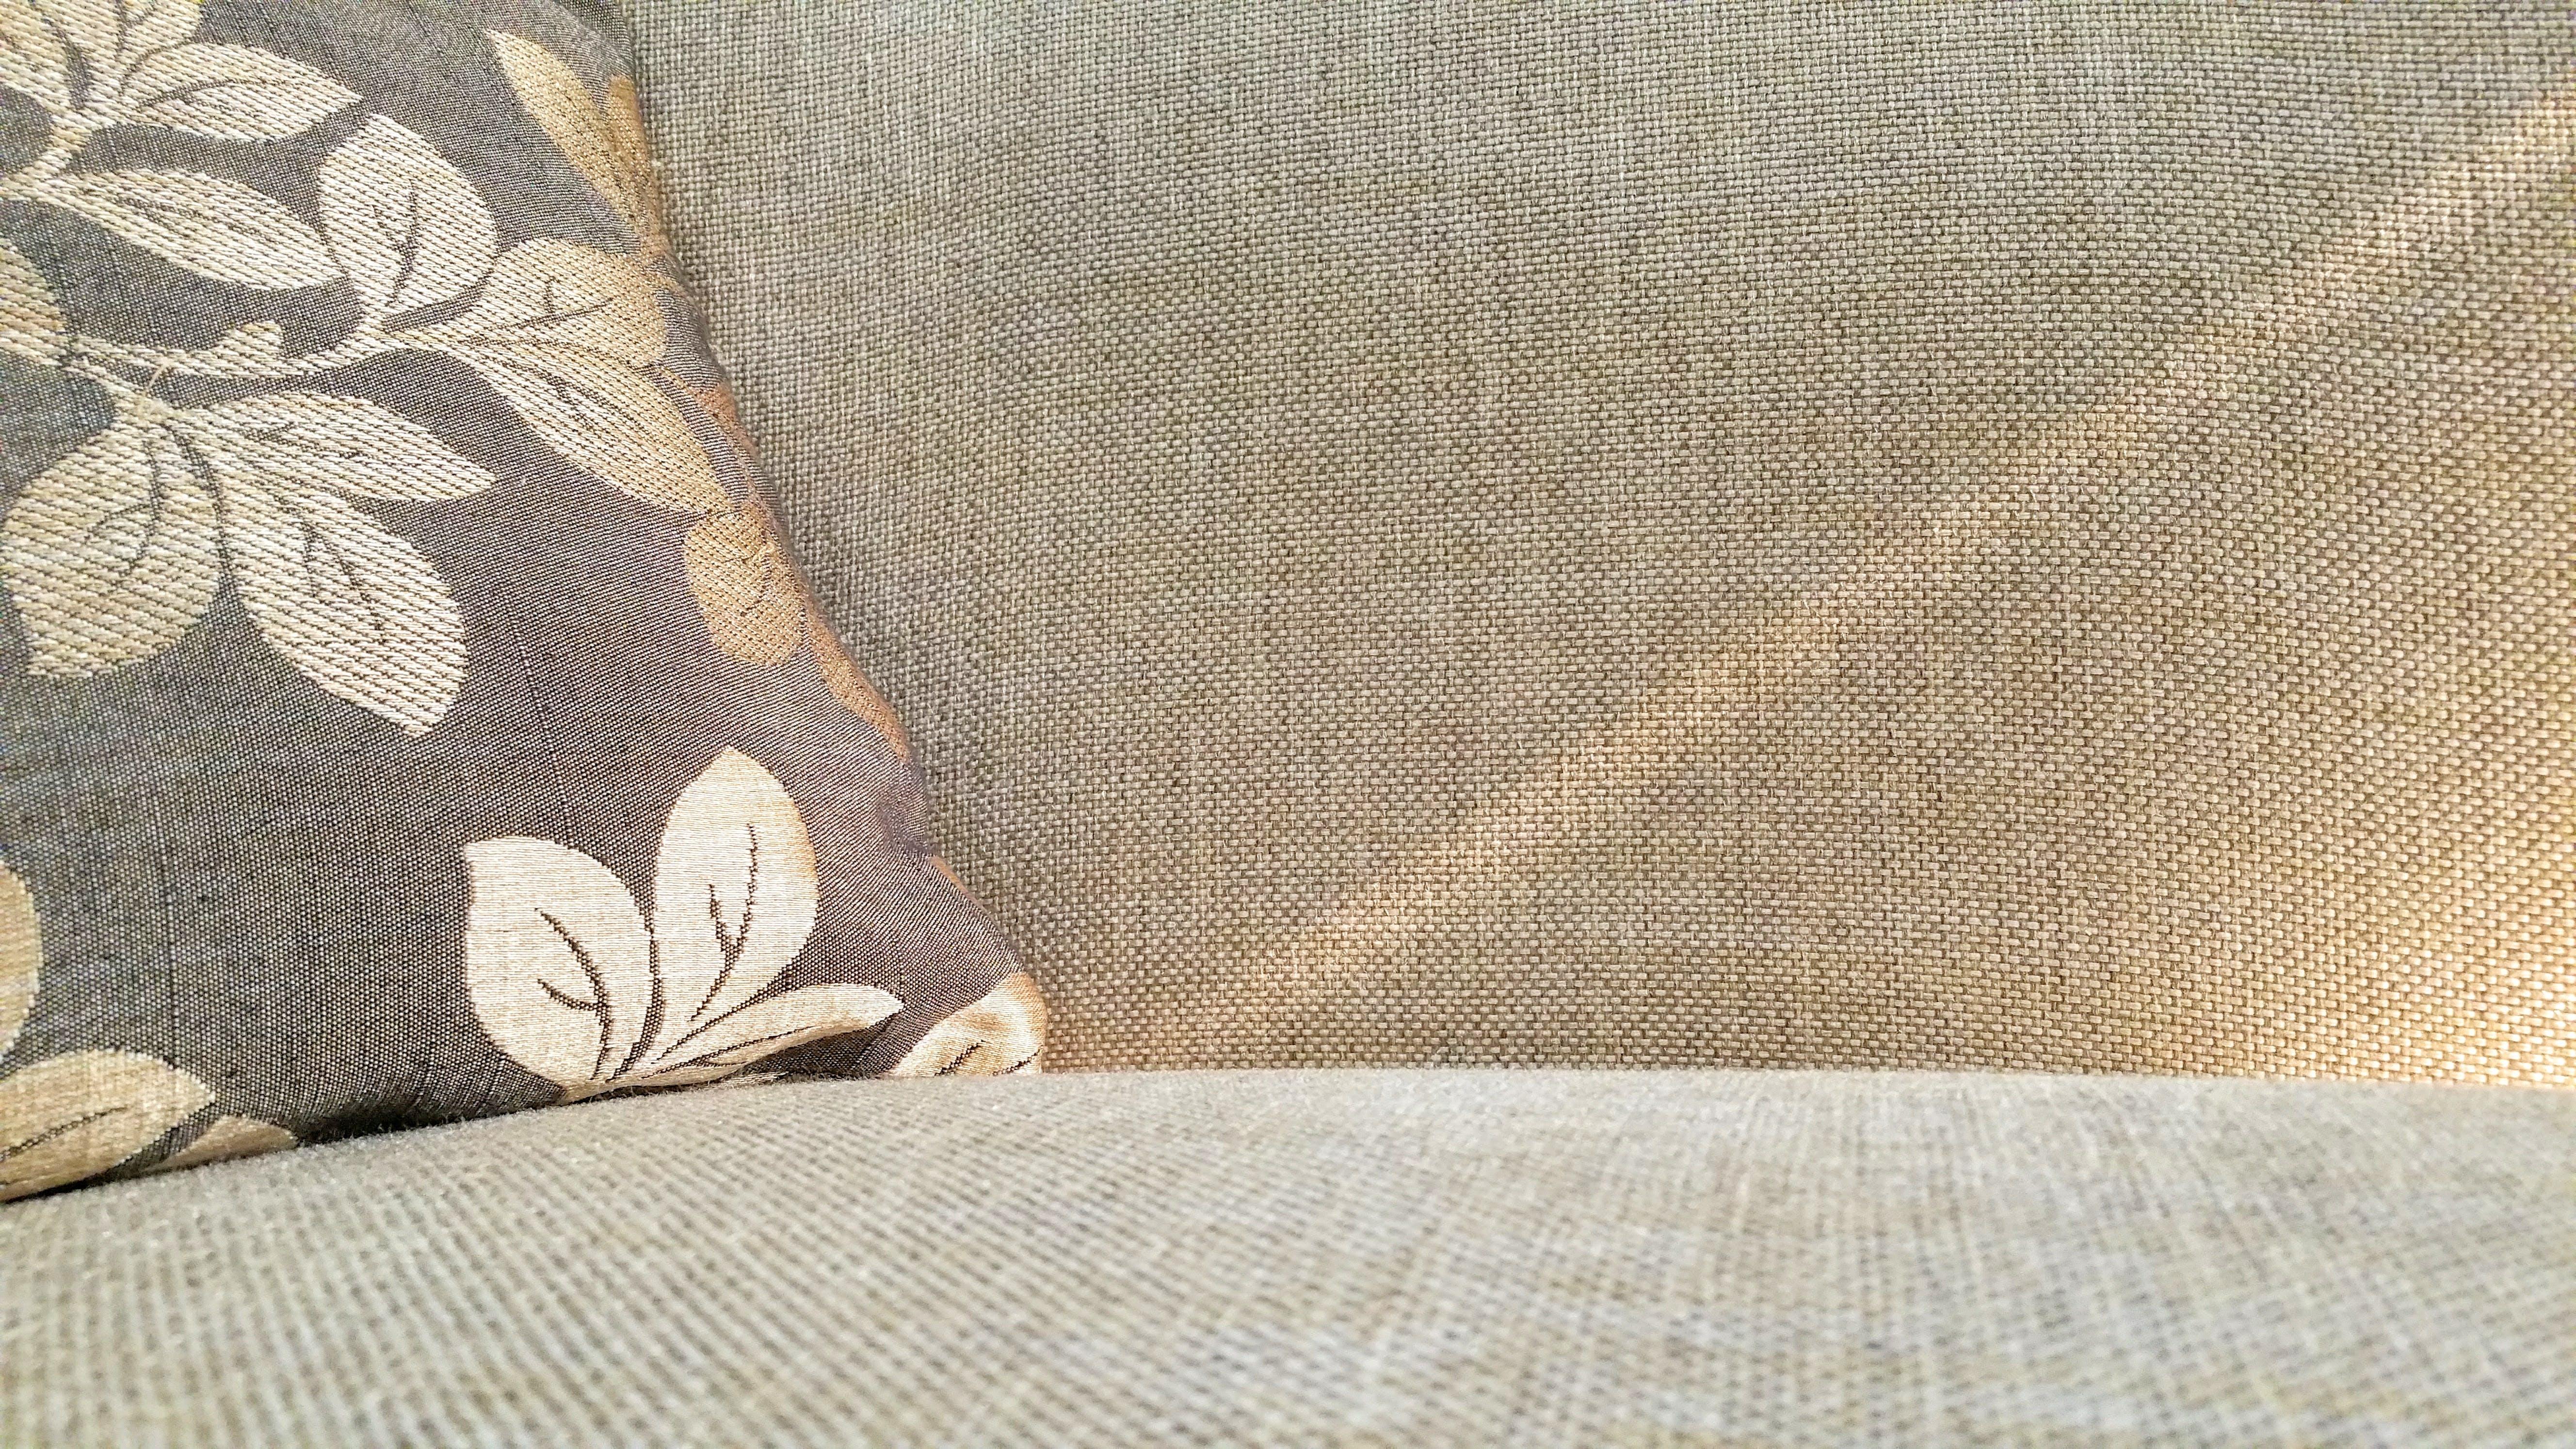 Free stock photo of blur, blurred, blurry, brown